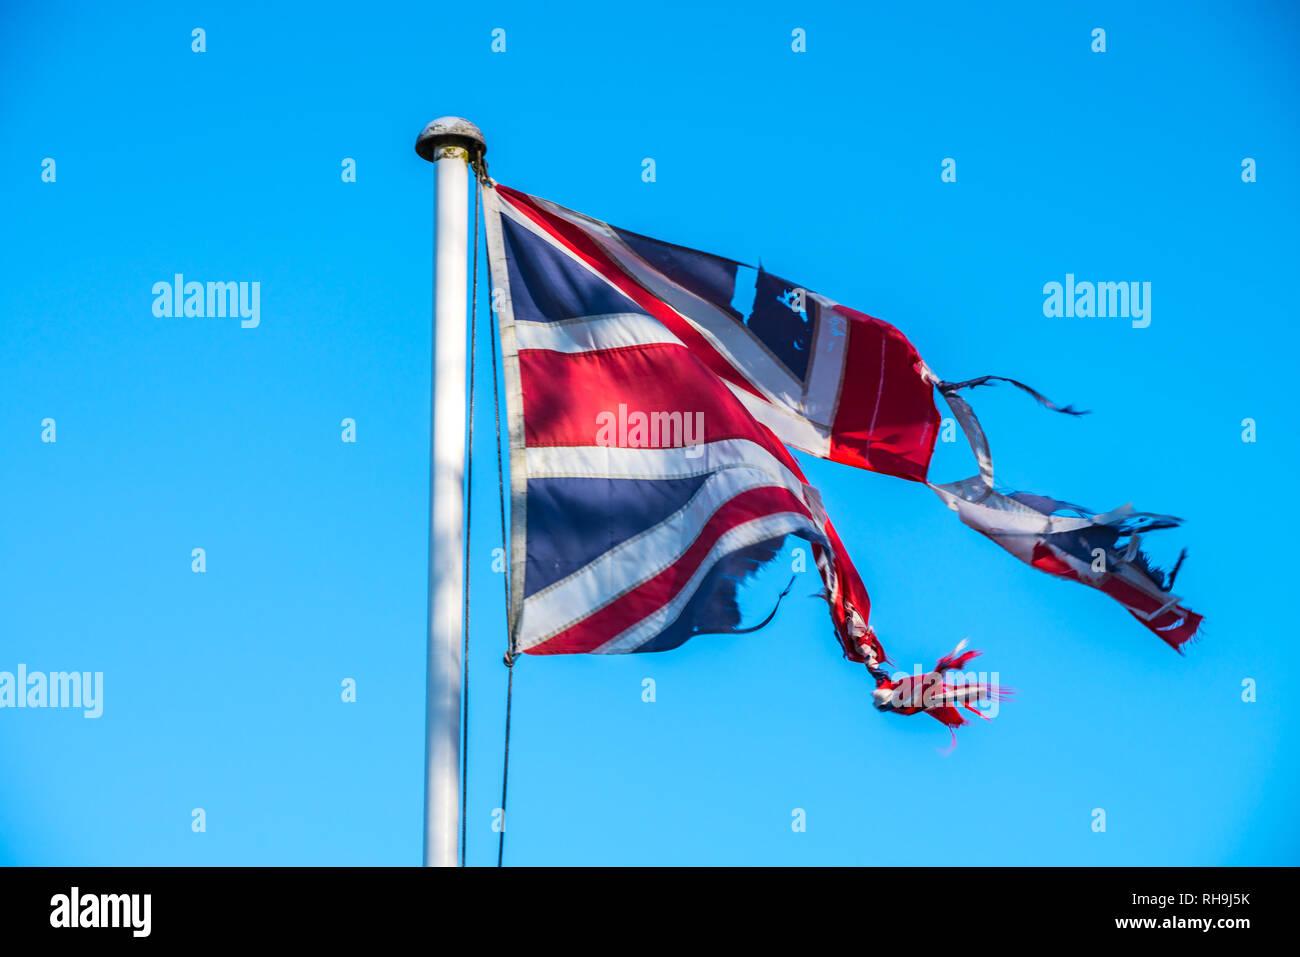 Badly torn Union Jack Flag symbol of the disharmony within UK over Brexit - Stock Image